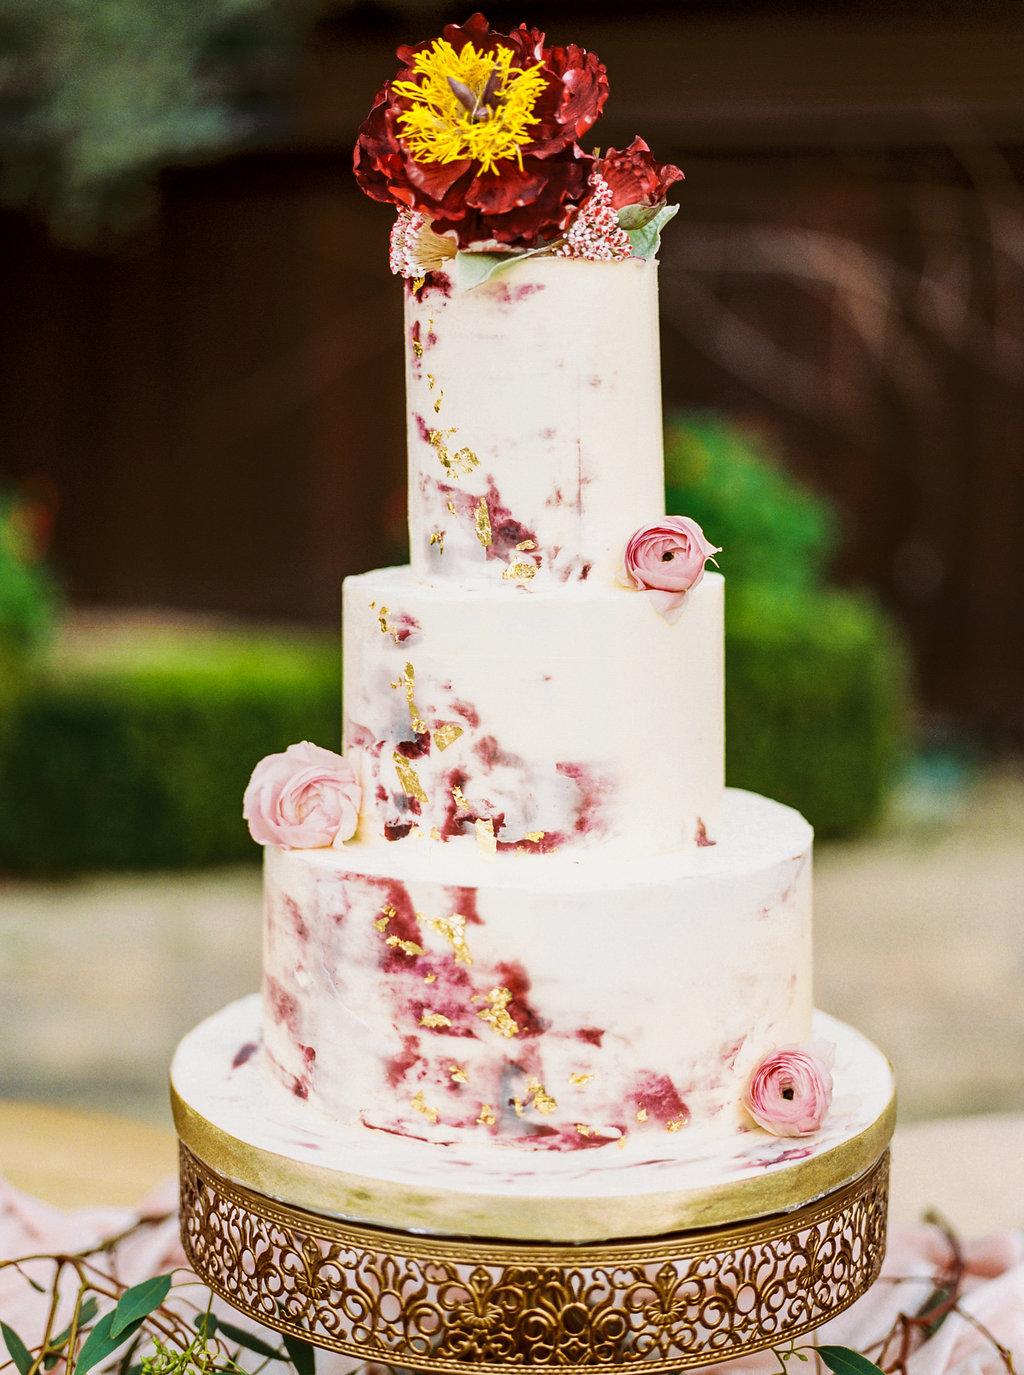 Photo by: Olivia Richards Photography  Cake Design: The Cakeldy